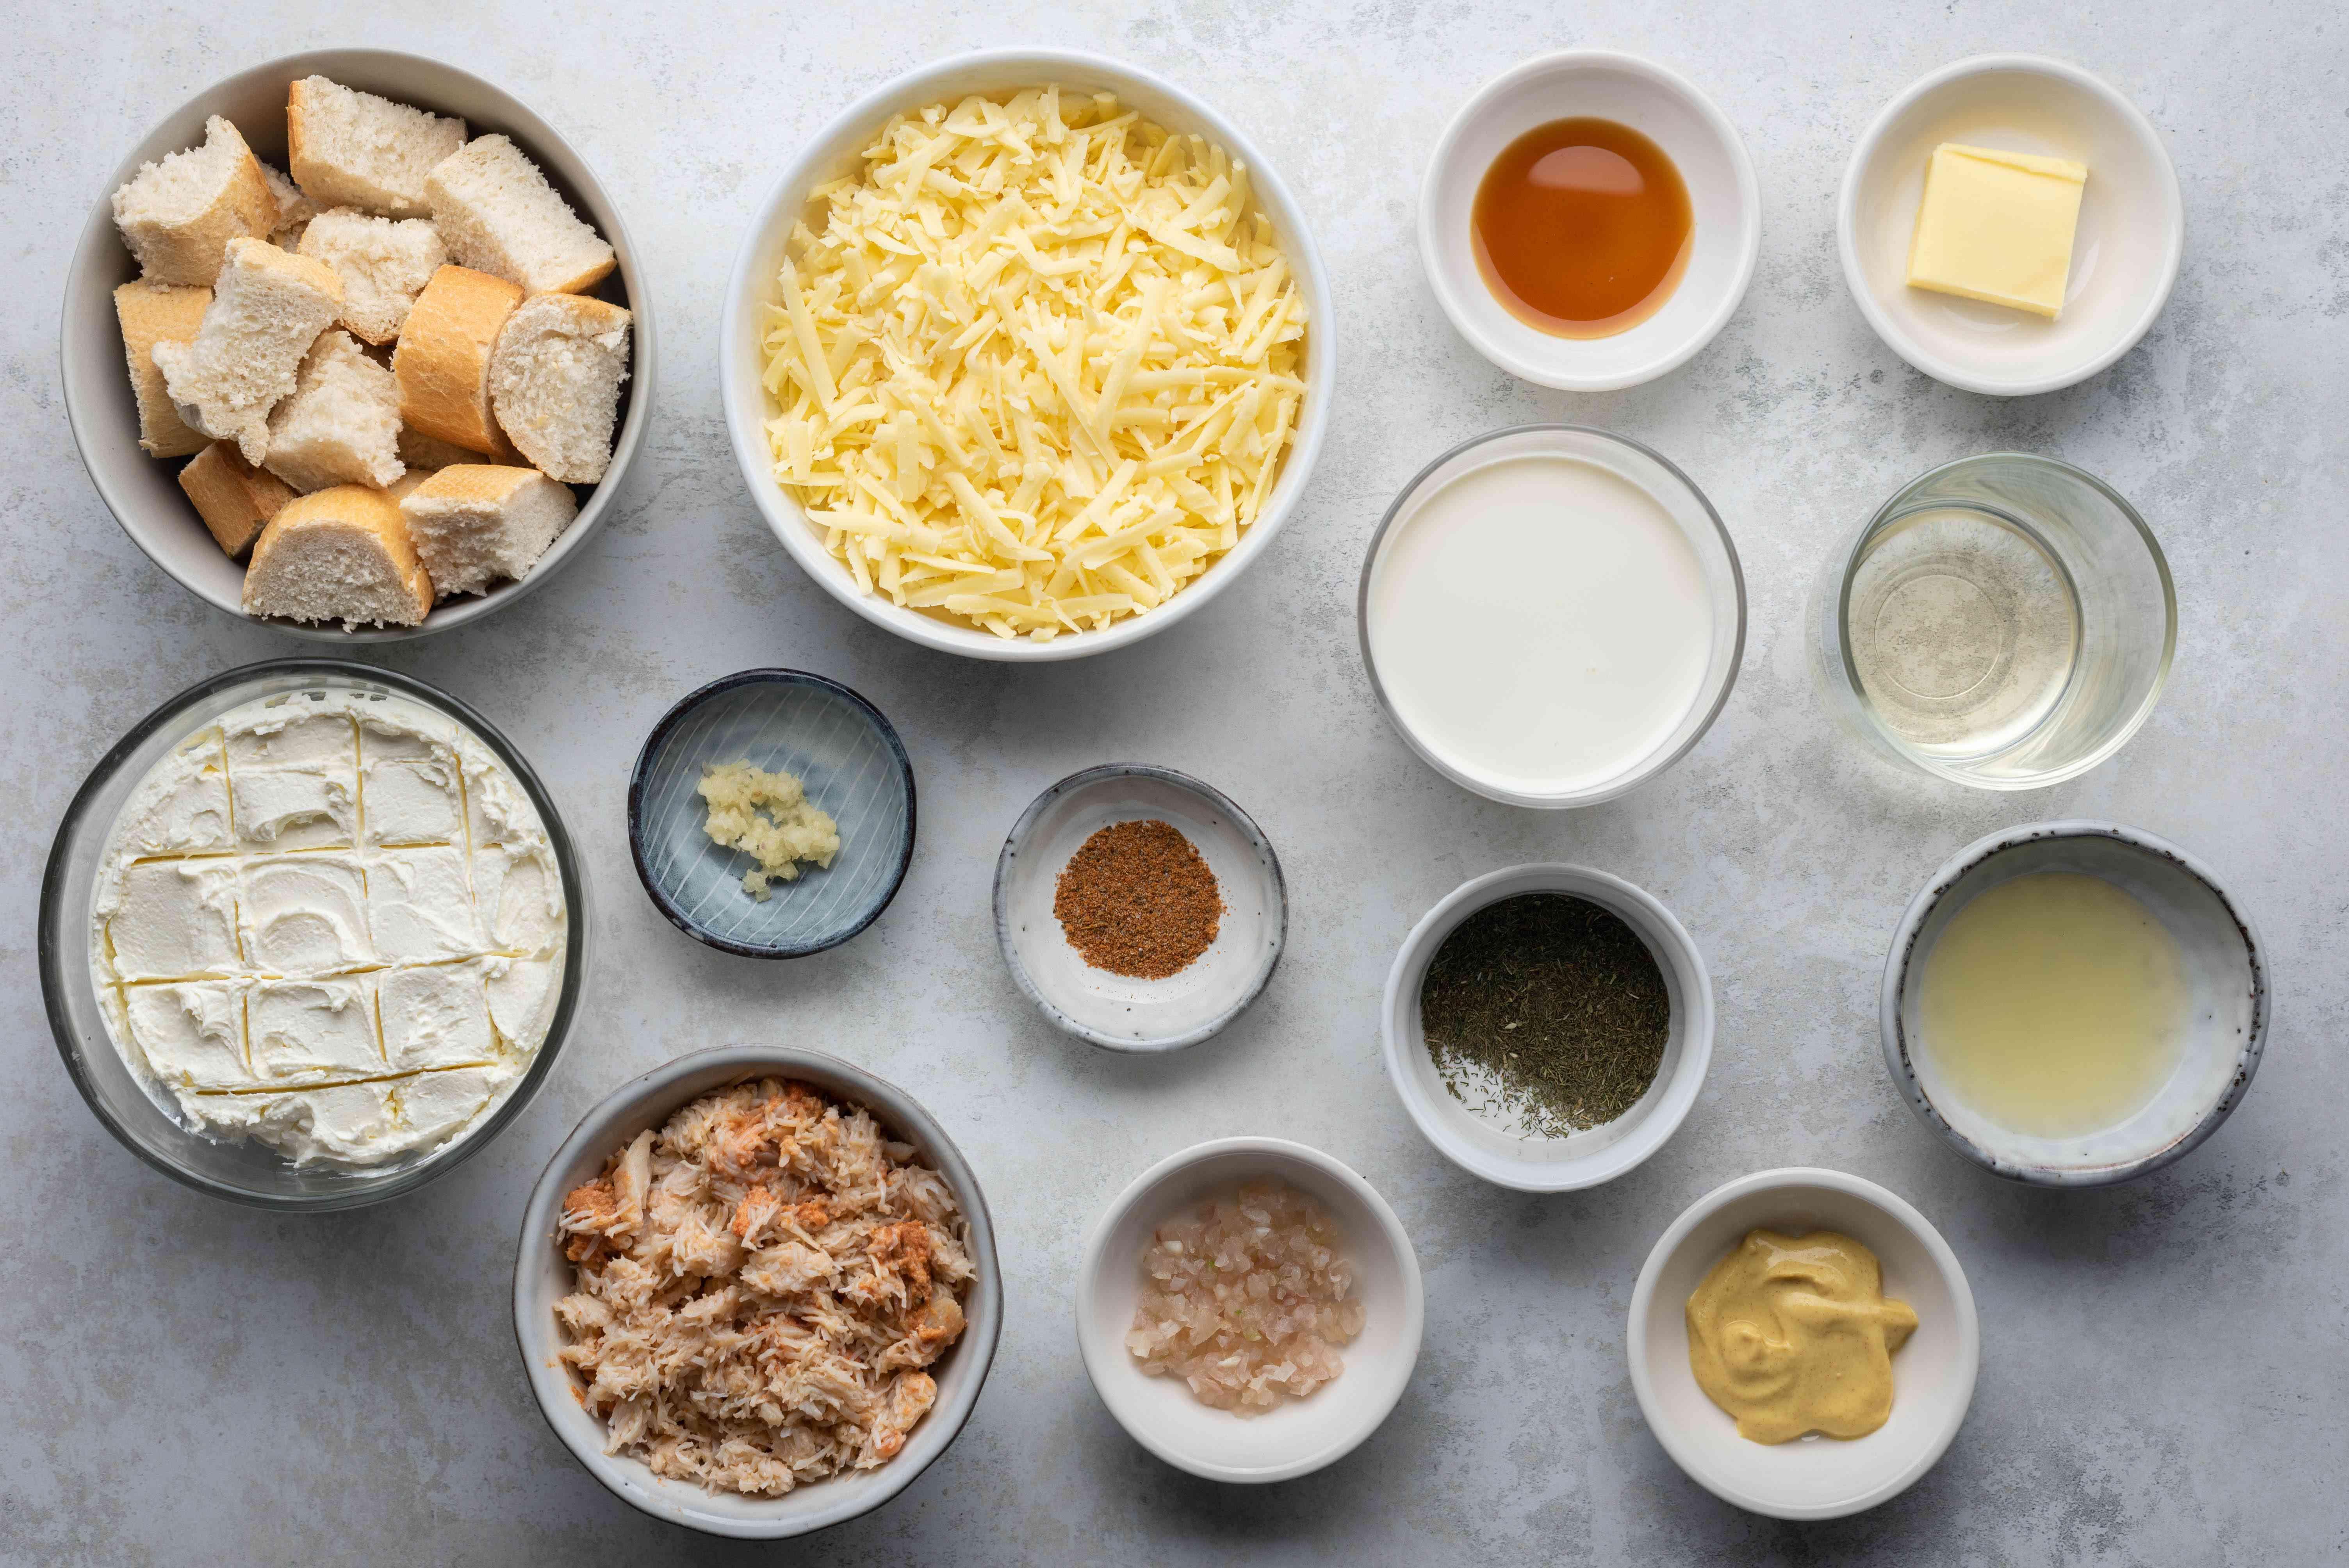 Hot Crab Fondue ingredients